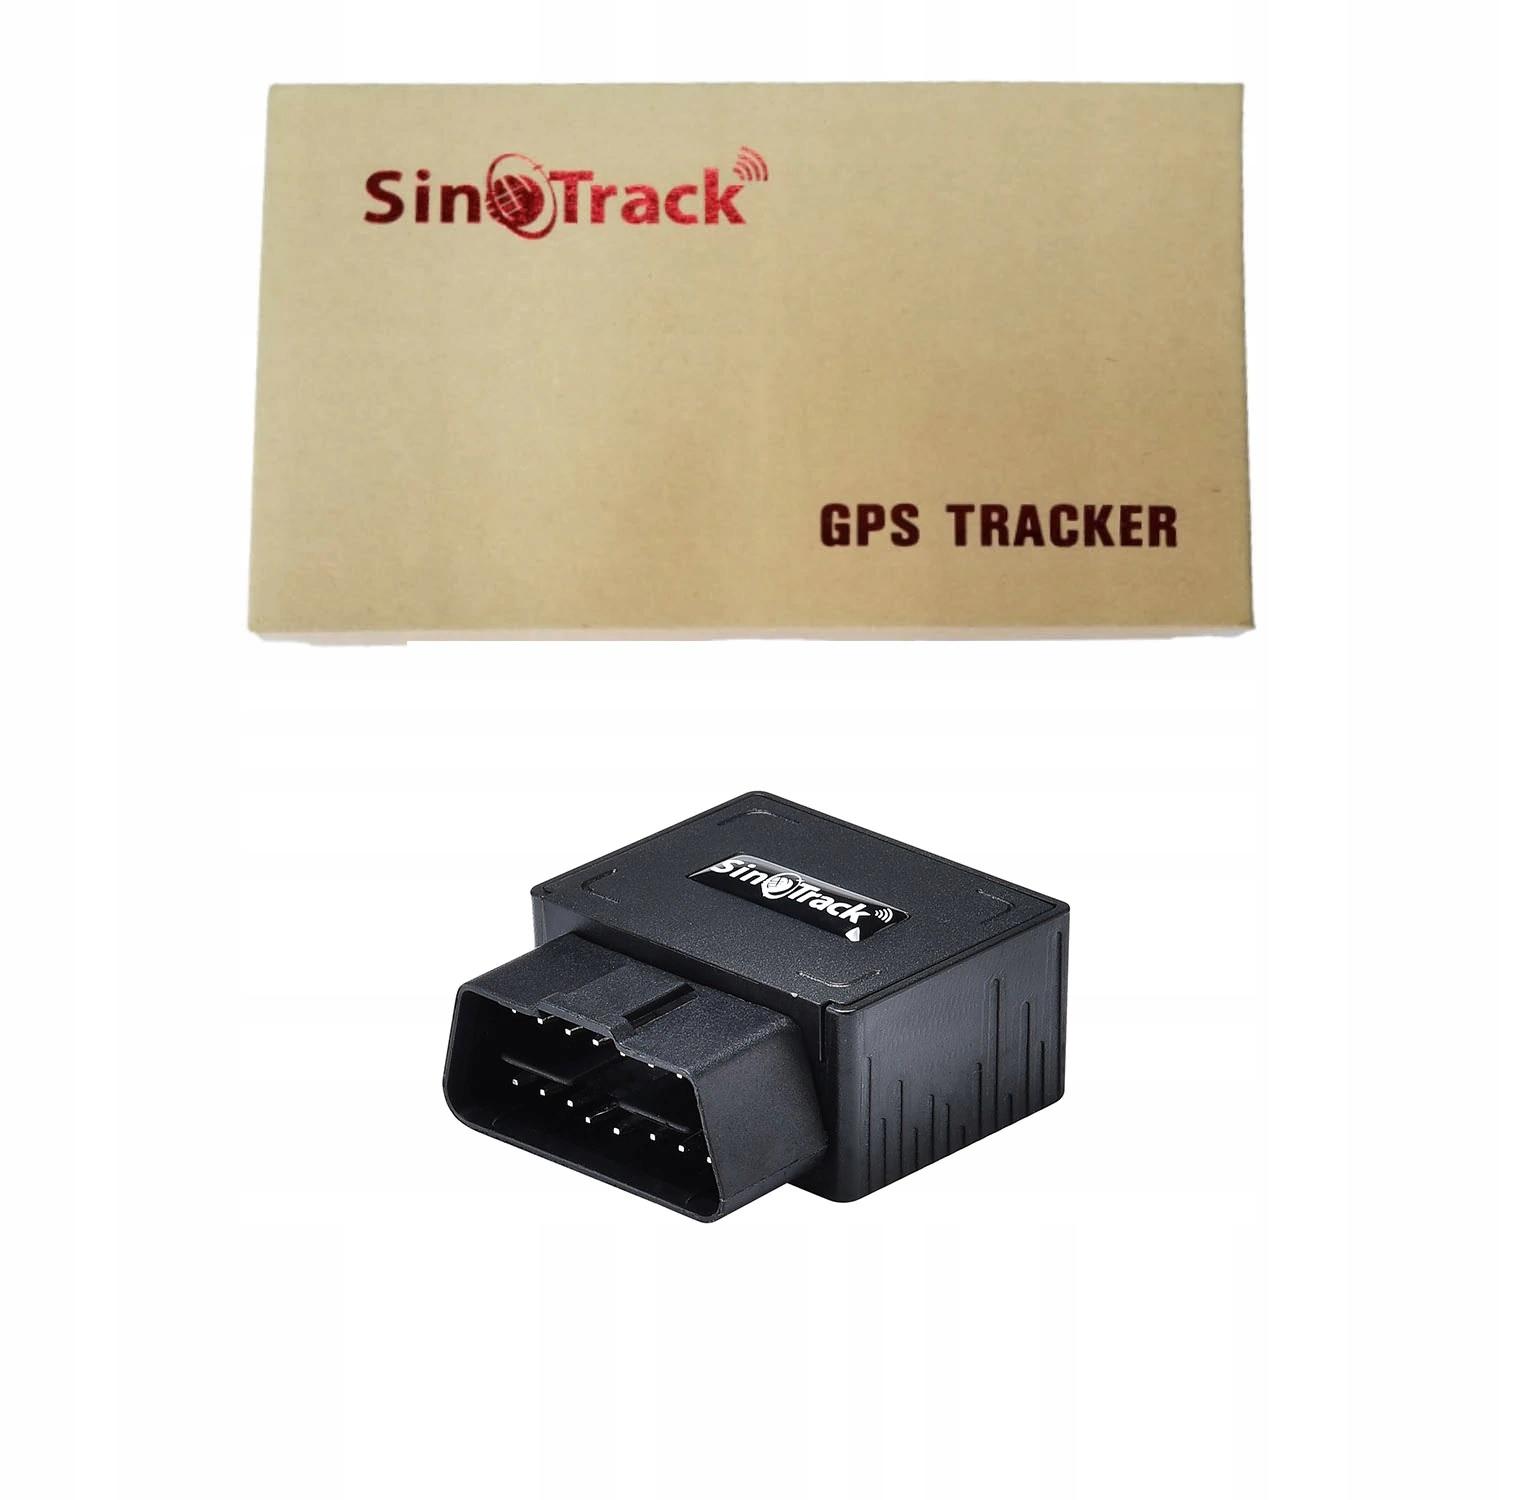 GPS GSM OBD do sledzenia pojazdów Plug & Play Model obd